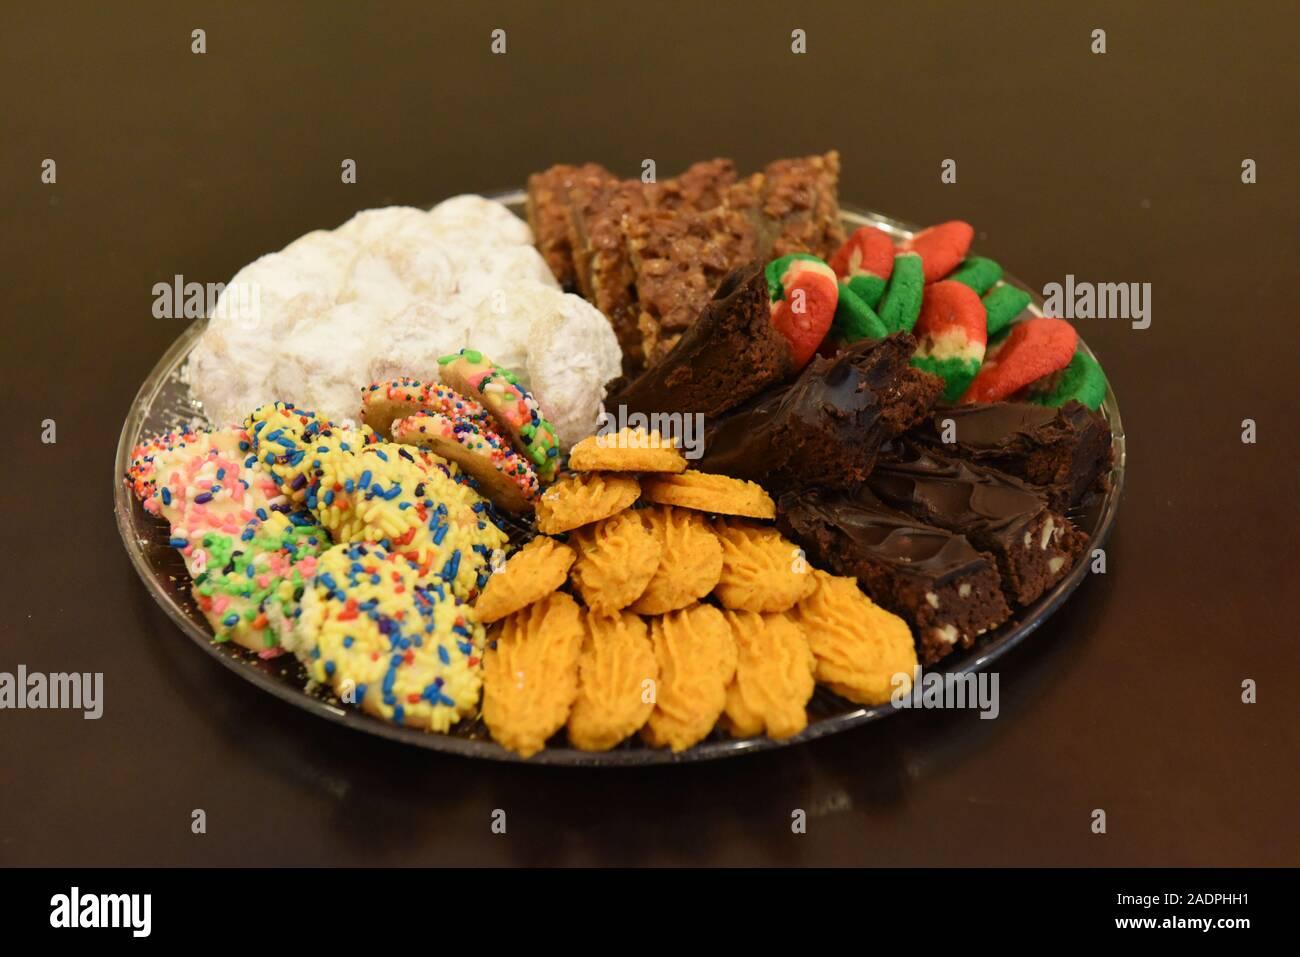 Assortiment de biscuits de Noël de diverses saveurs Banque D'Images